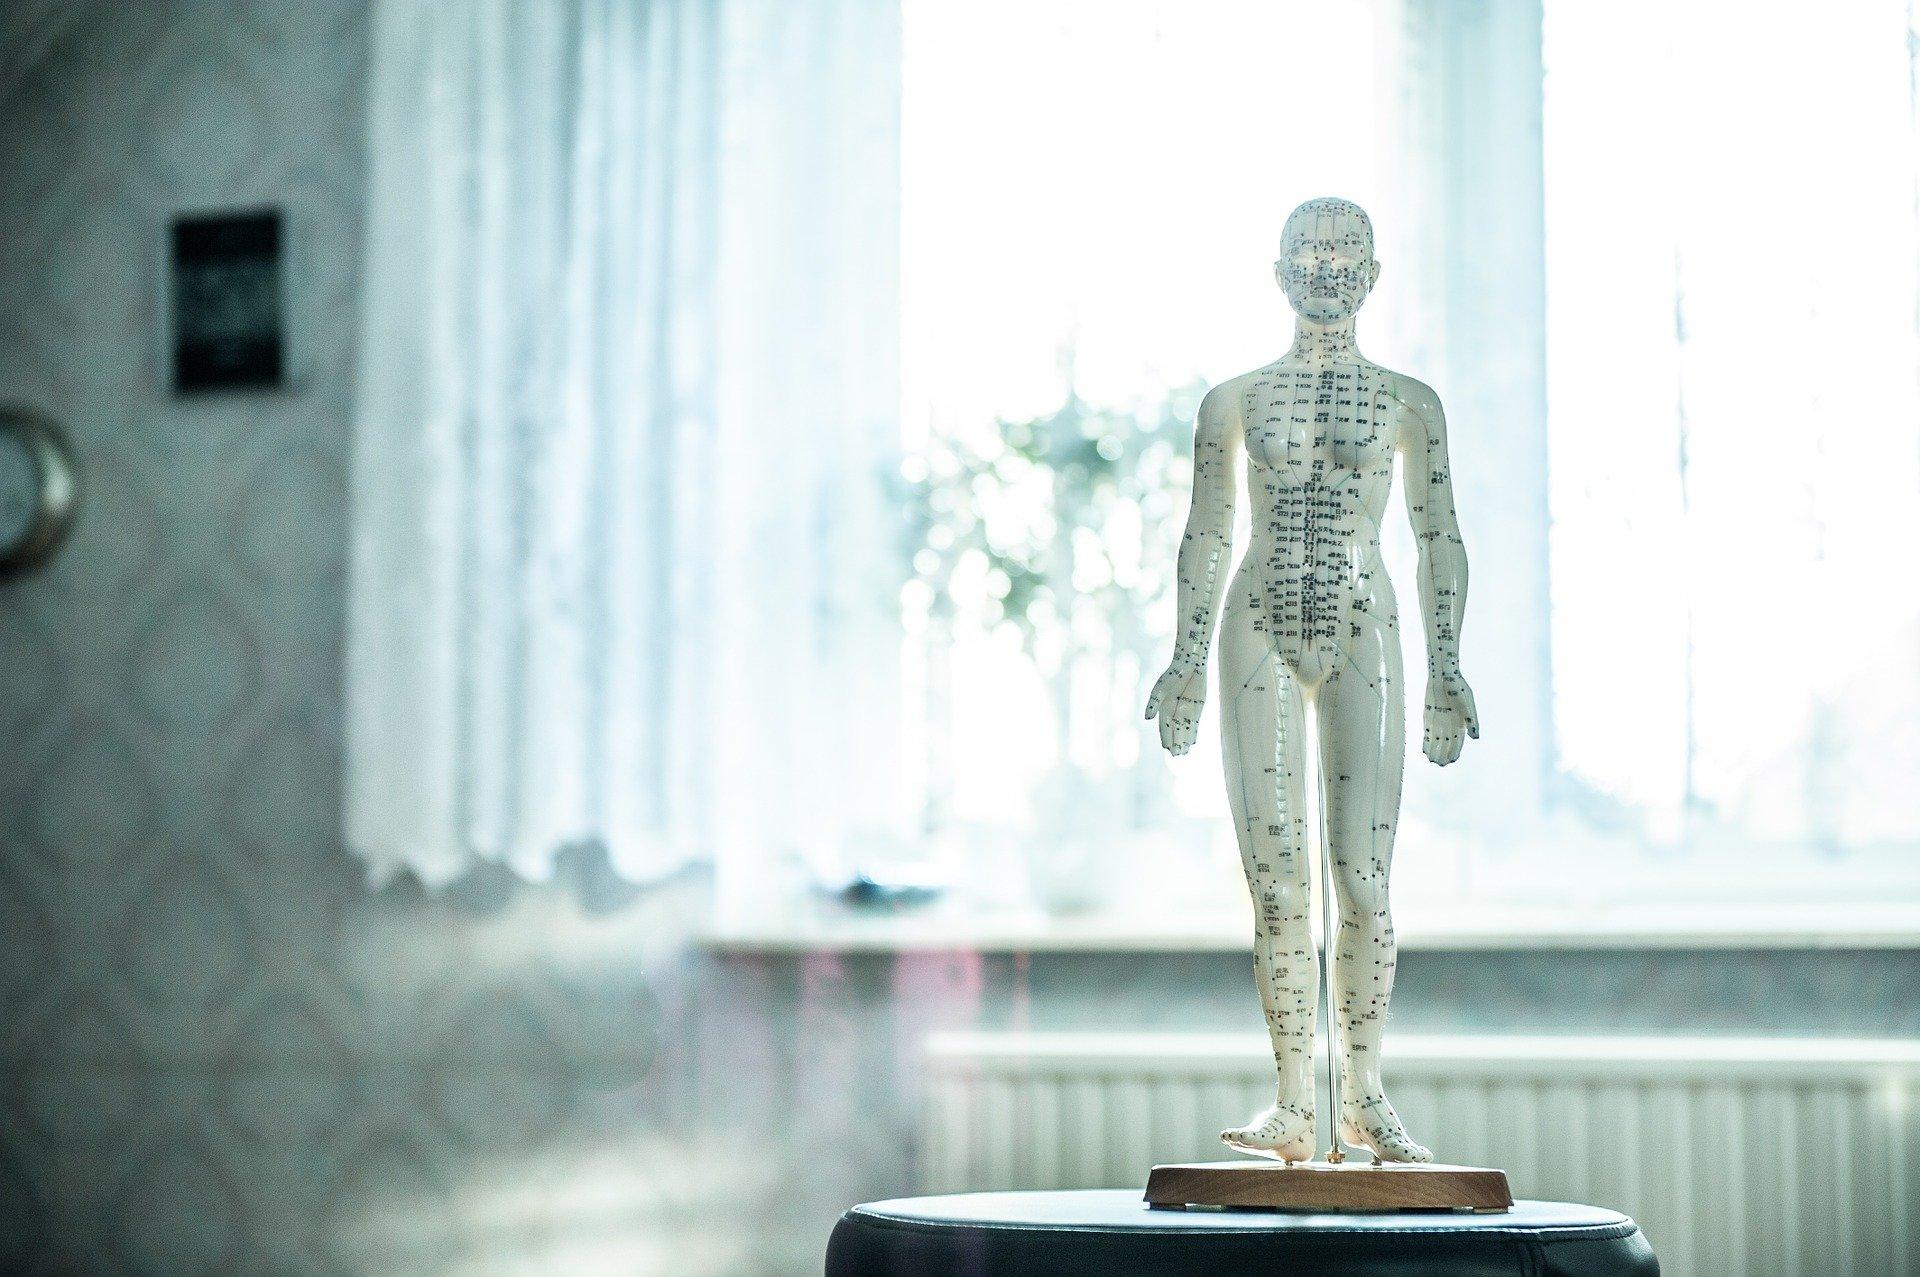 Why I choose Alternative Health Care